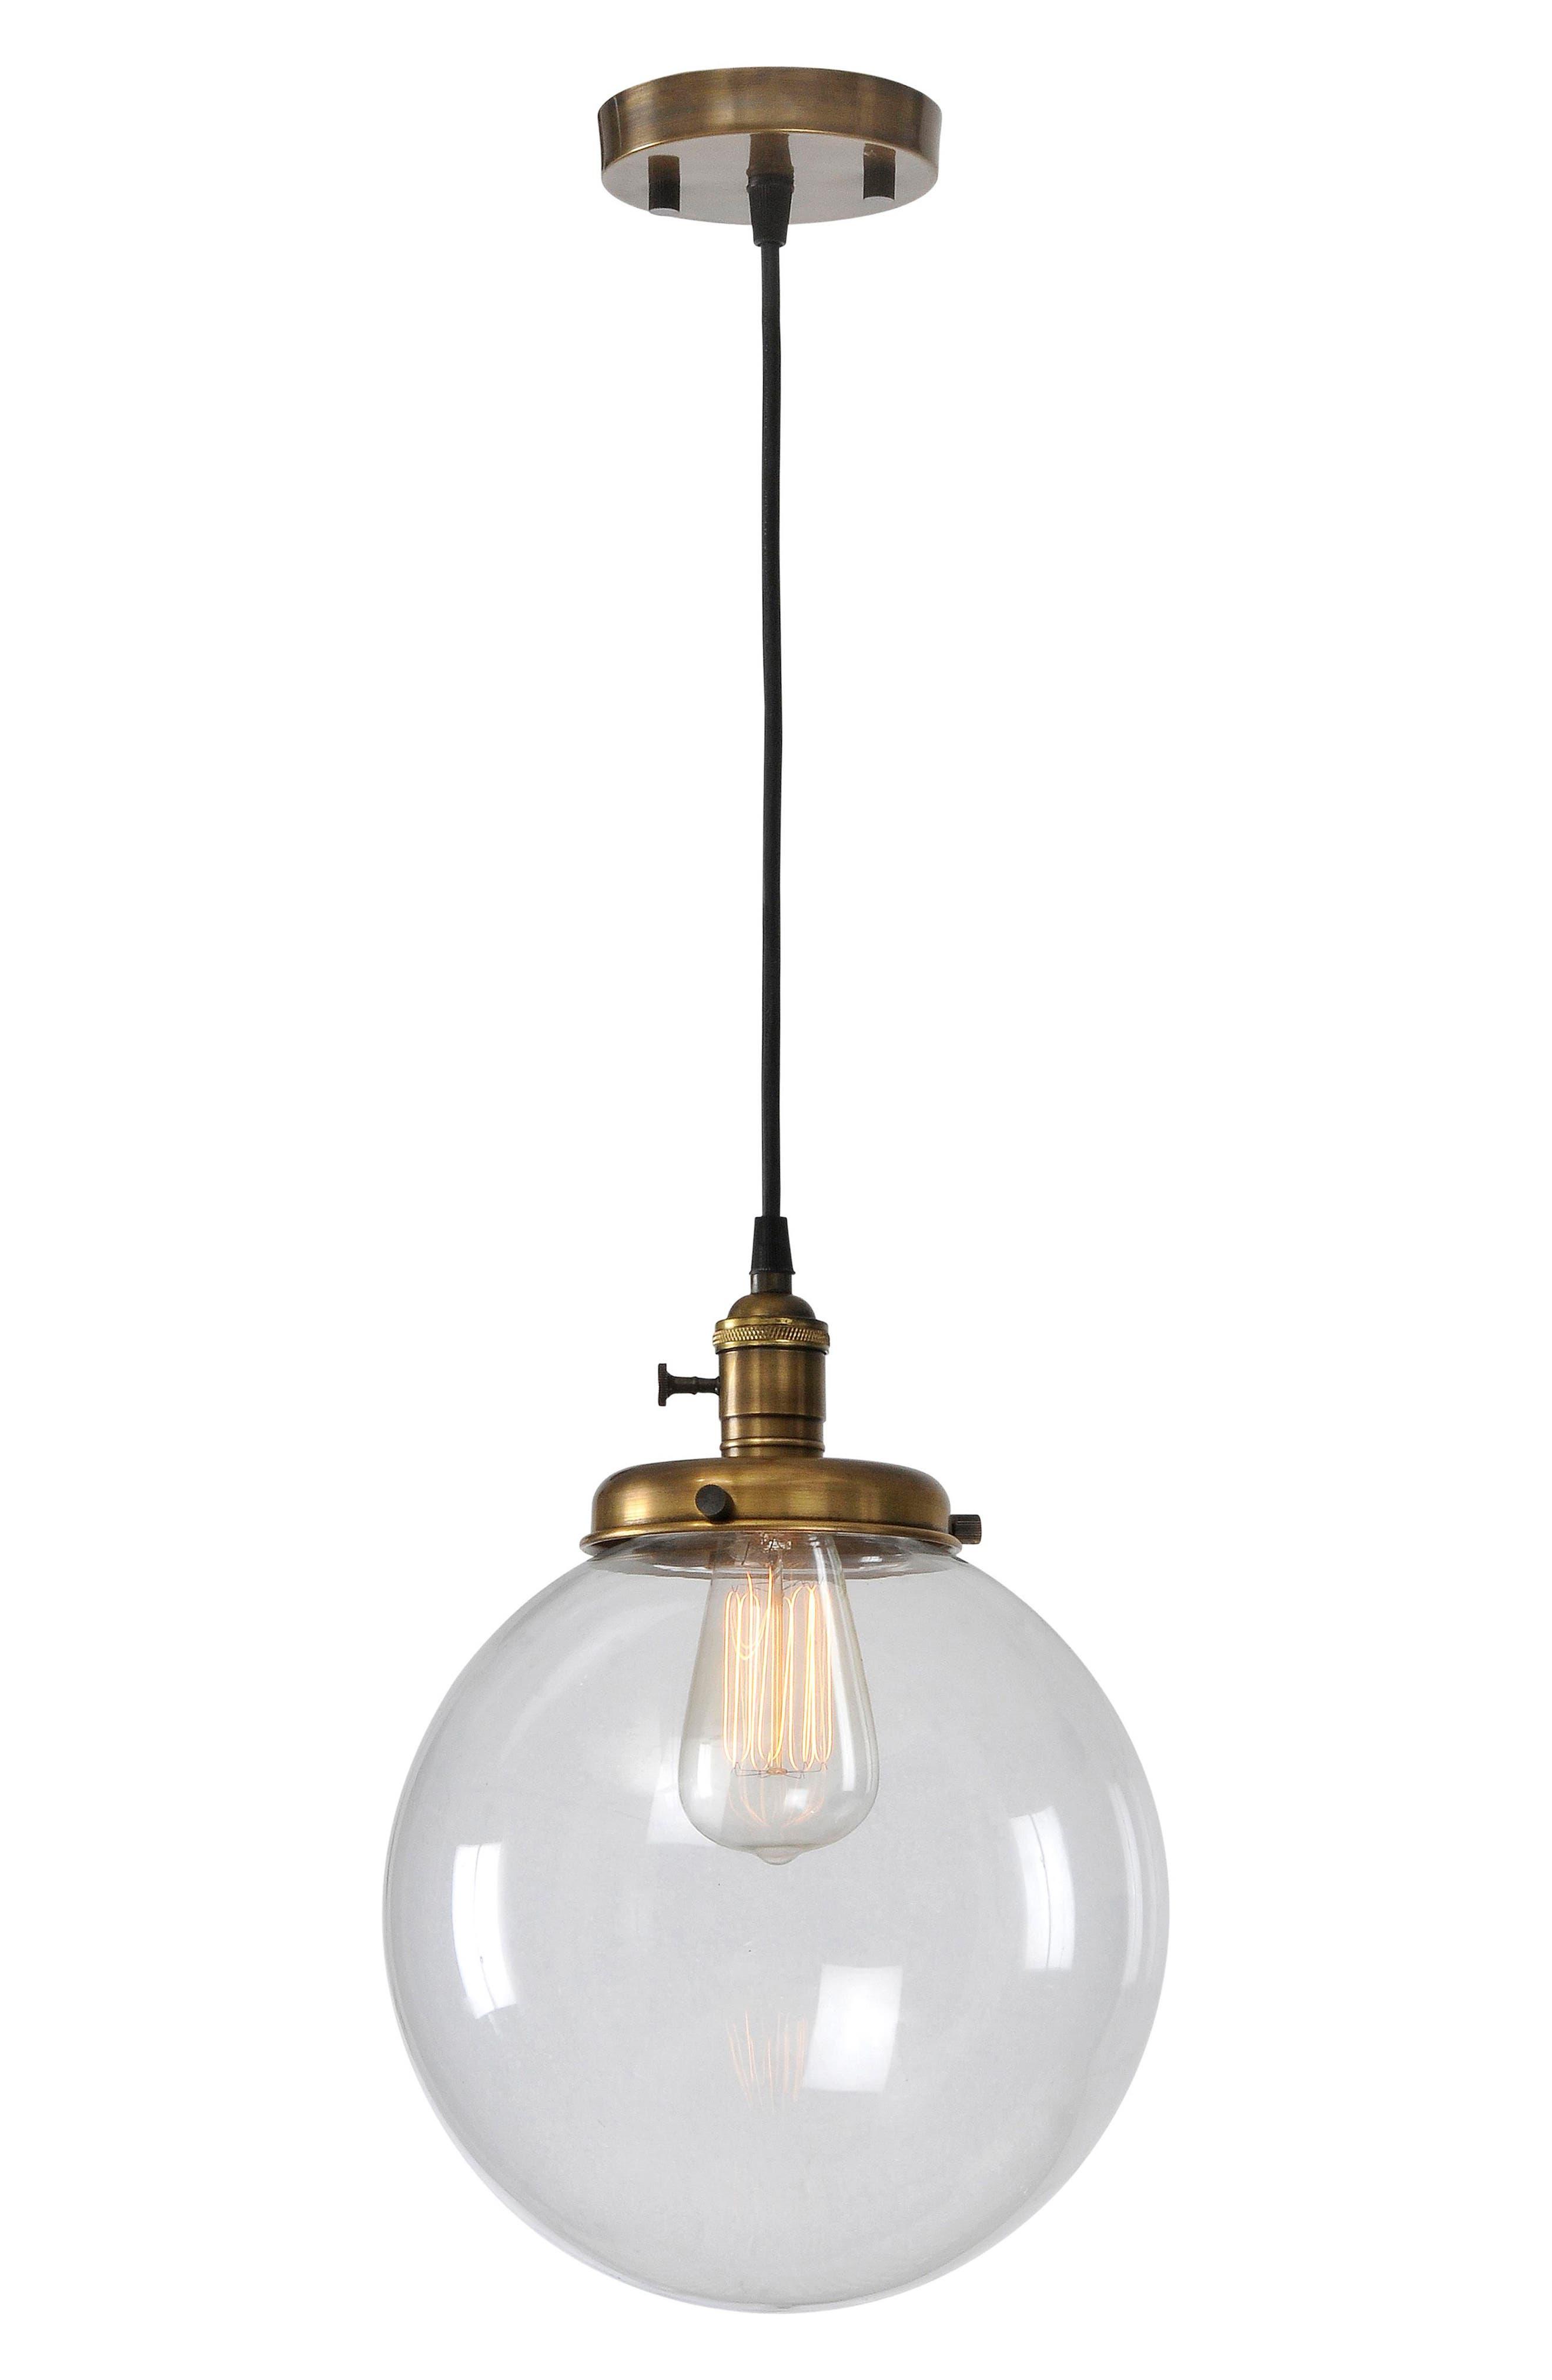 Renwil Antonio Ceiling Light Fixture